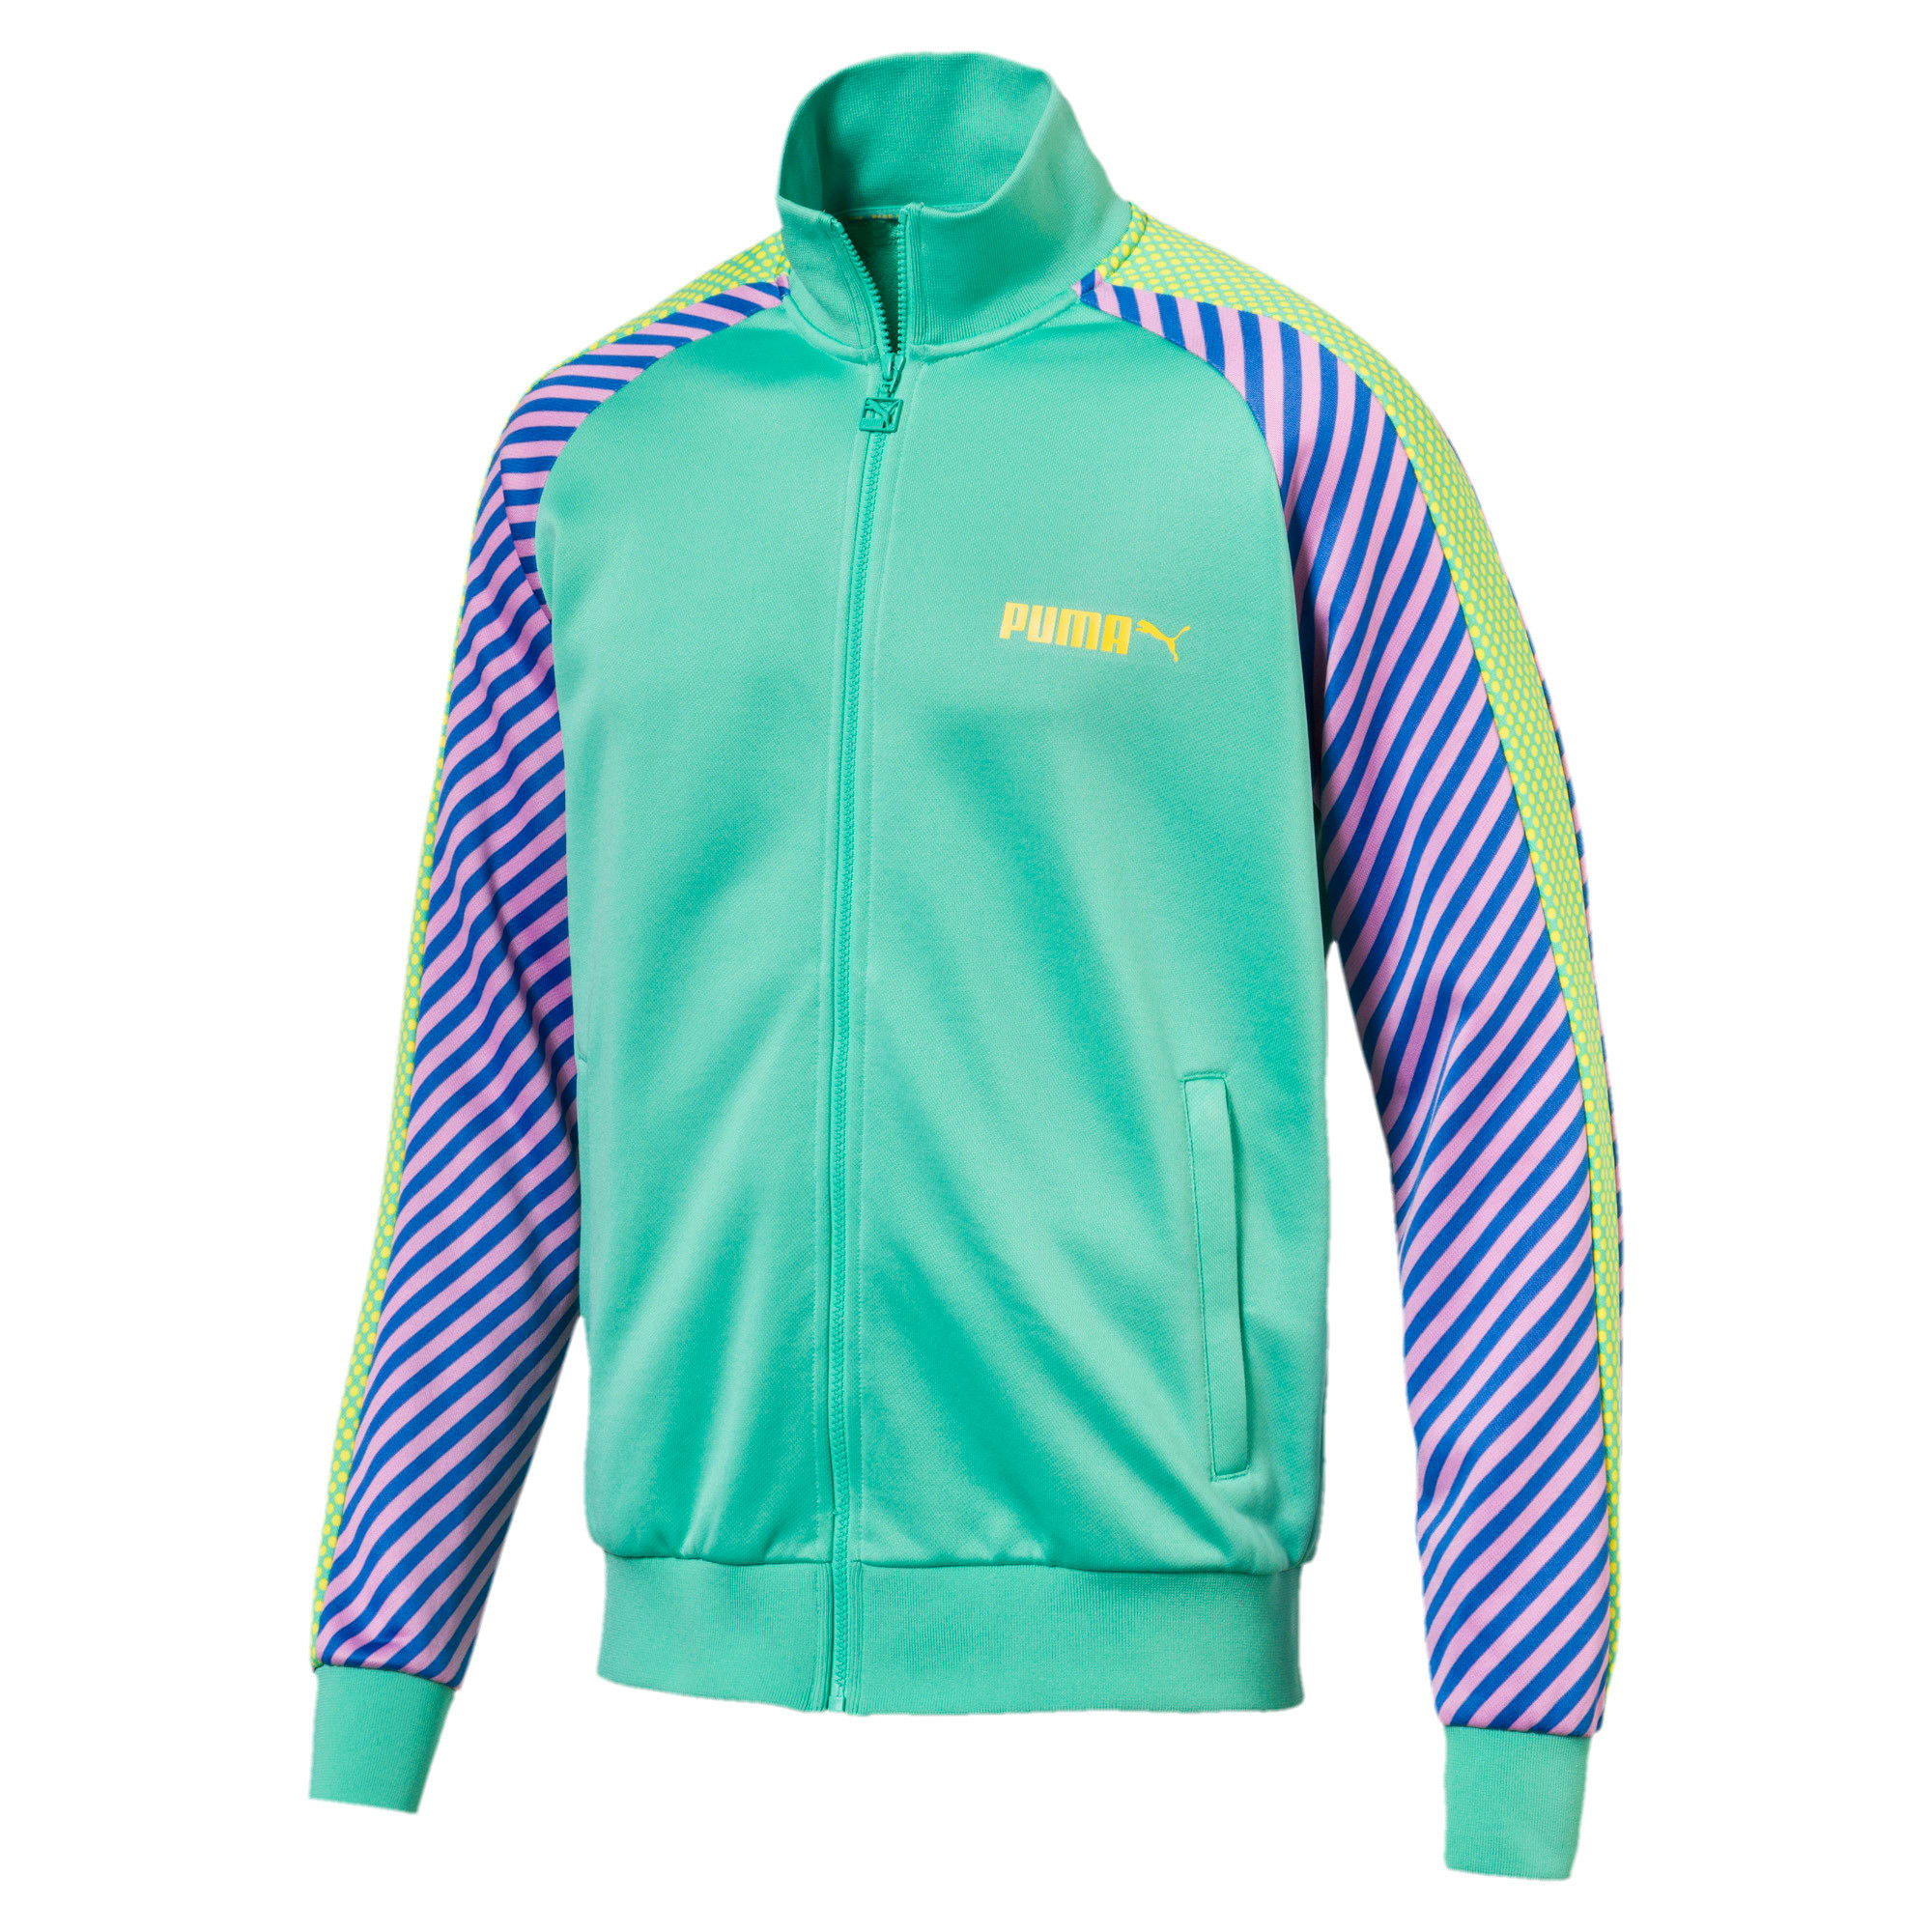 Thumbnail 1 of T7 Pop Zip-Up Men's Track Jacket, Biscay Green, medium